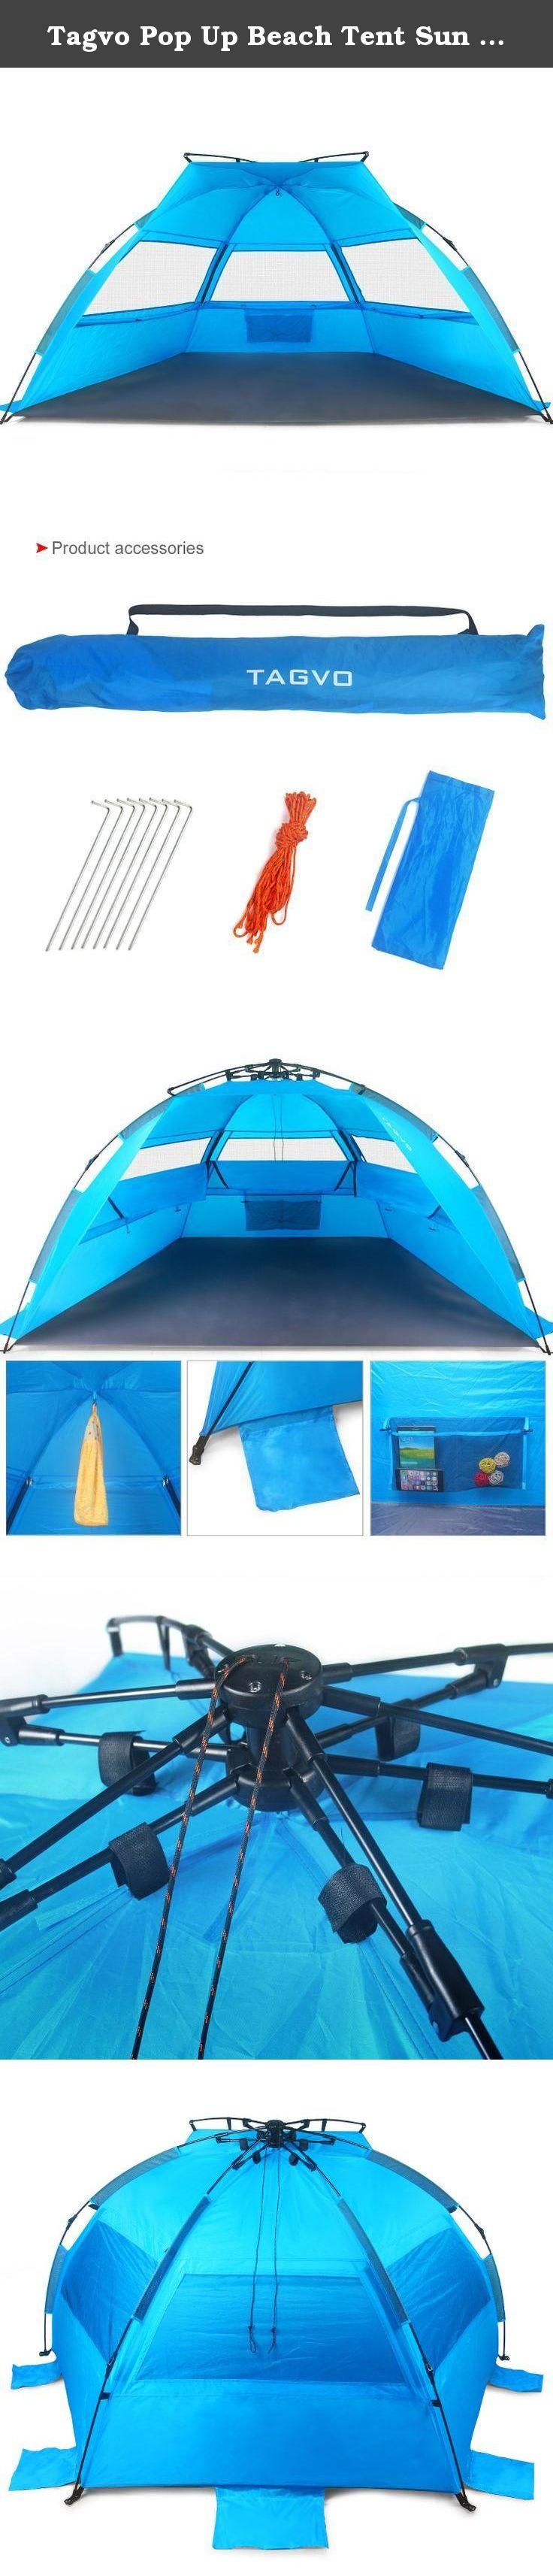 Tagvo Pop Up Beach Tent Sun Shelter Easy Set Tear Down Fibergl Frame Lightweight